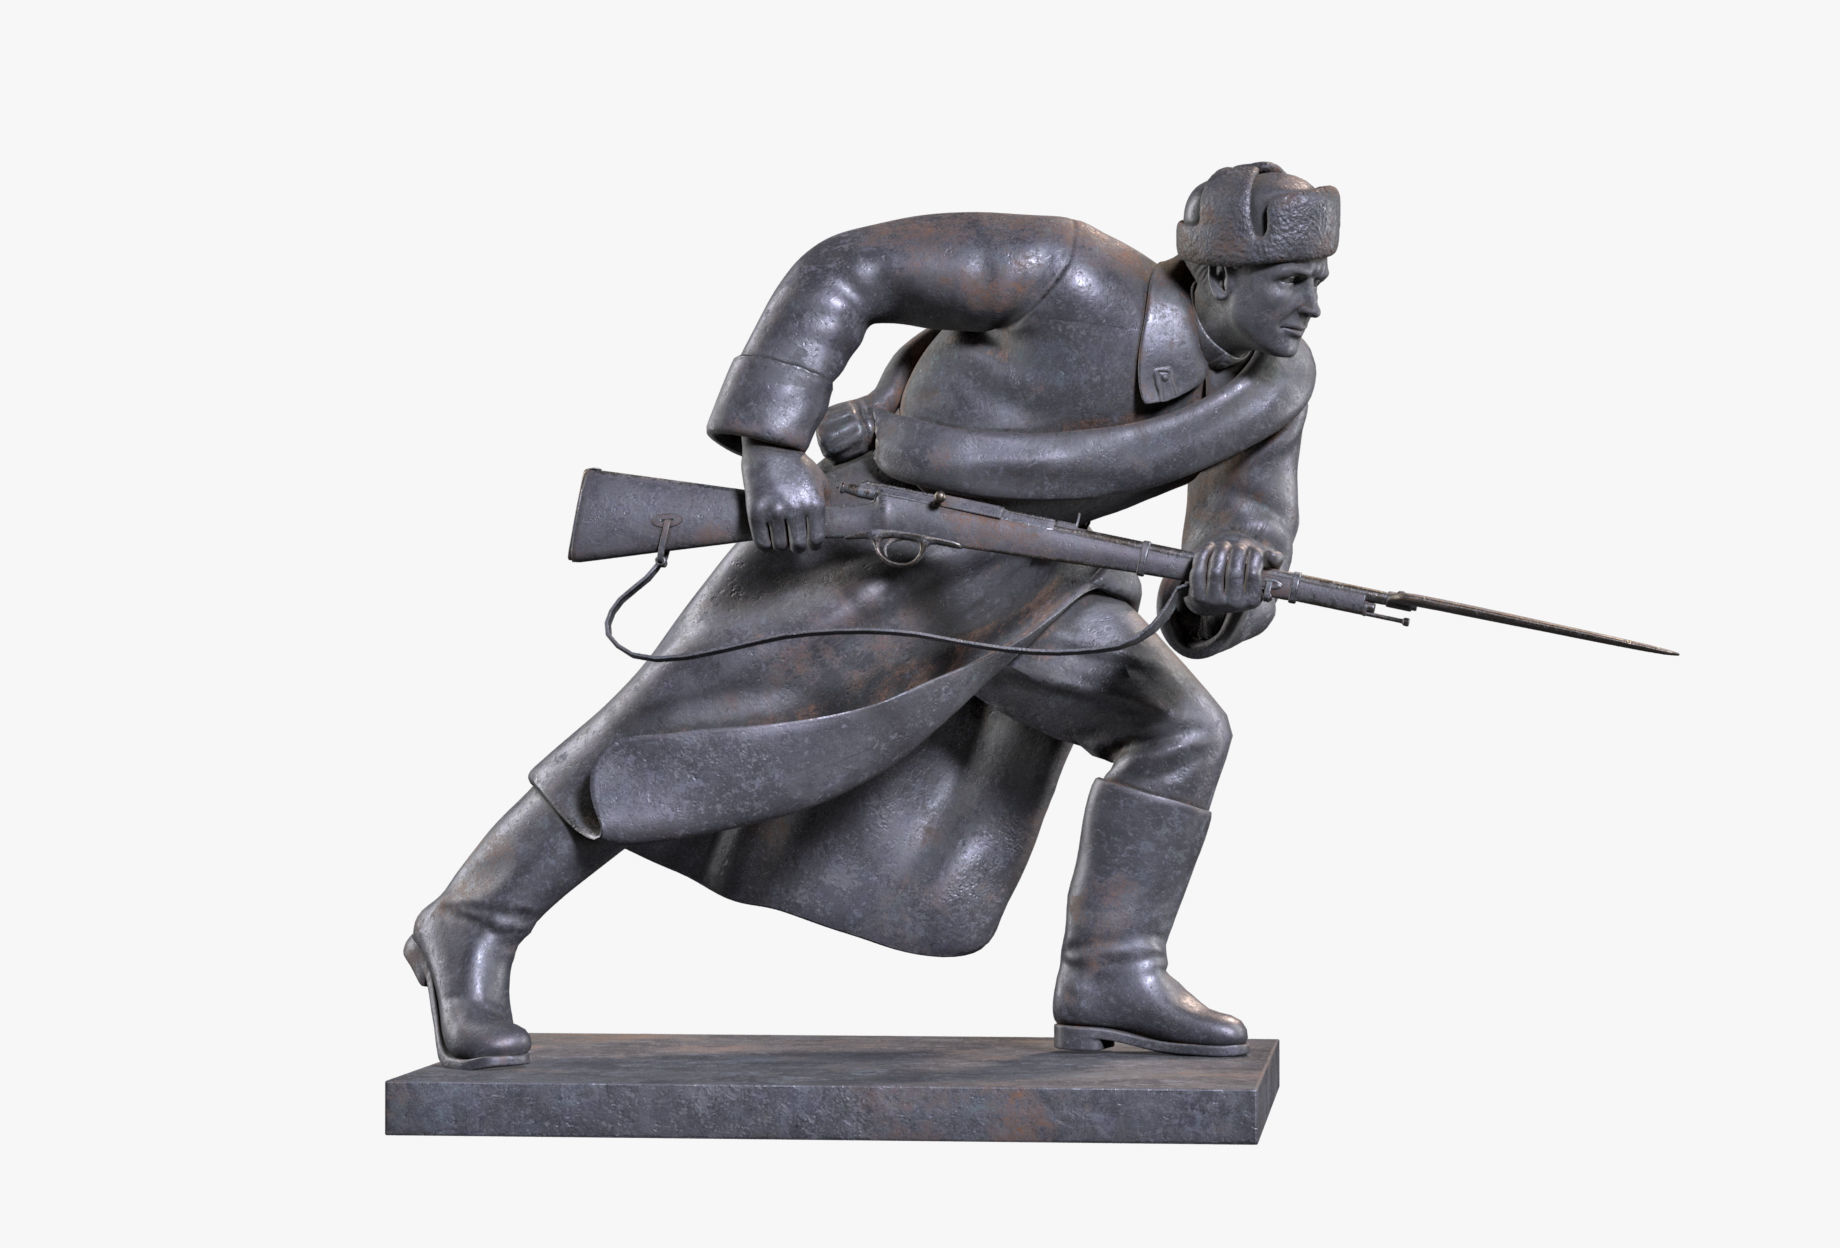 Infantryman Sculpture